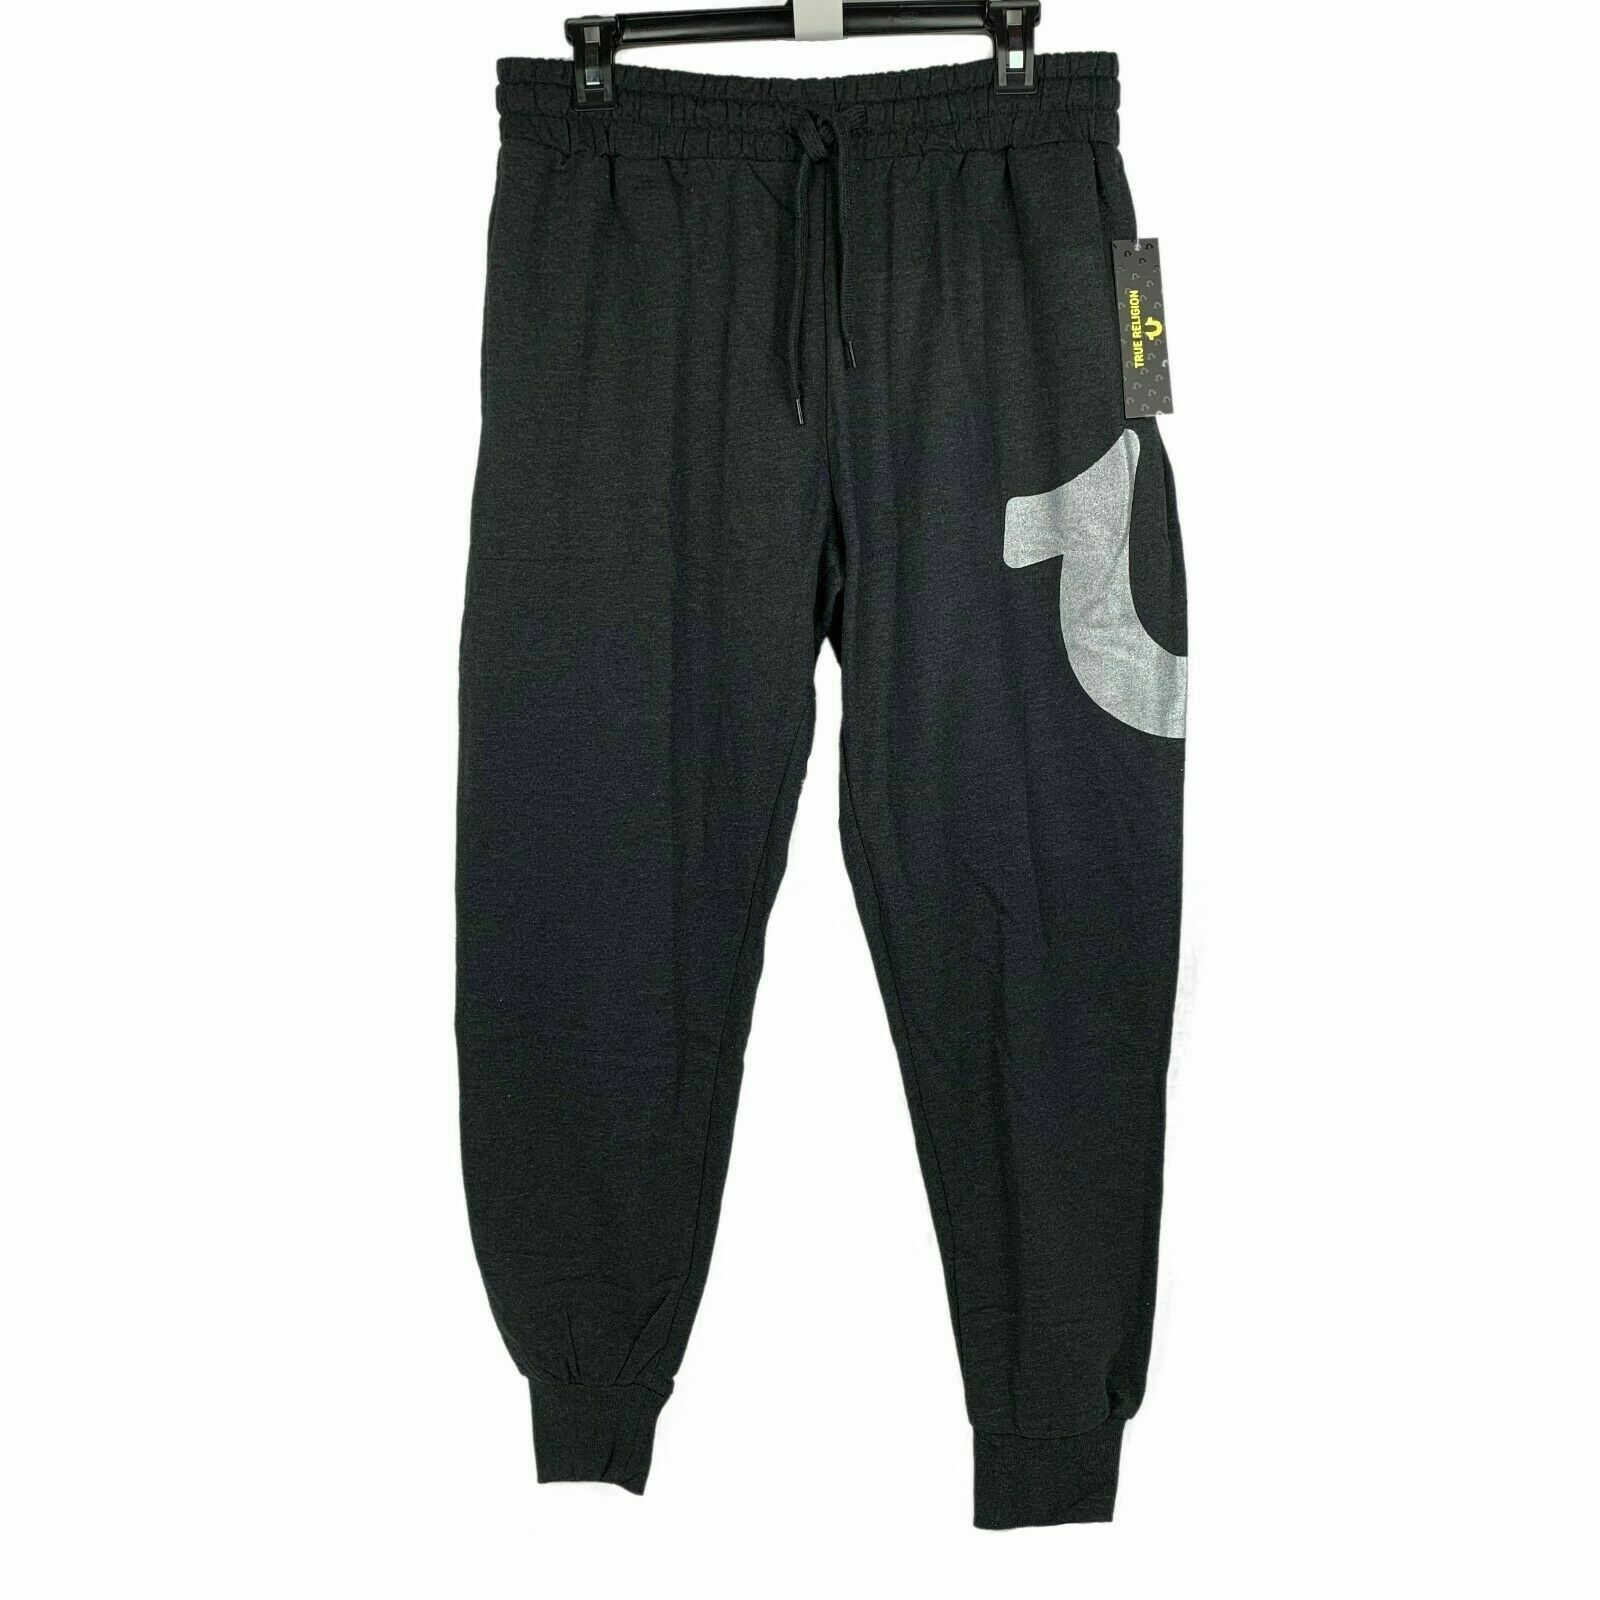 NWT True Religion Sweatpants Men's Joggers Horseshoe Logo S M L XL